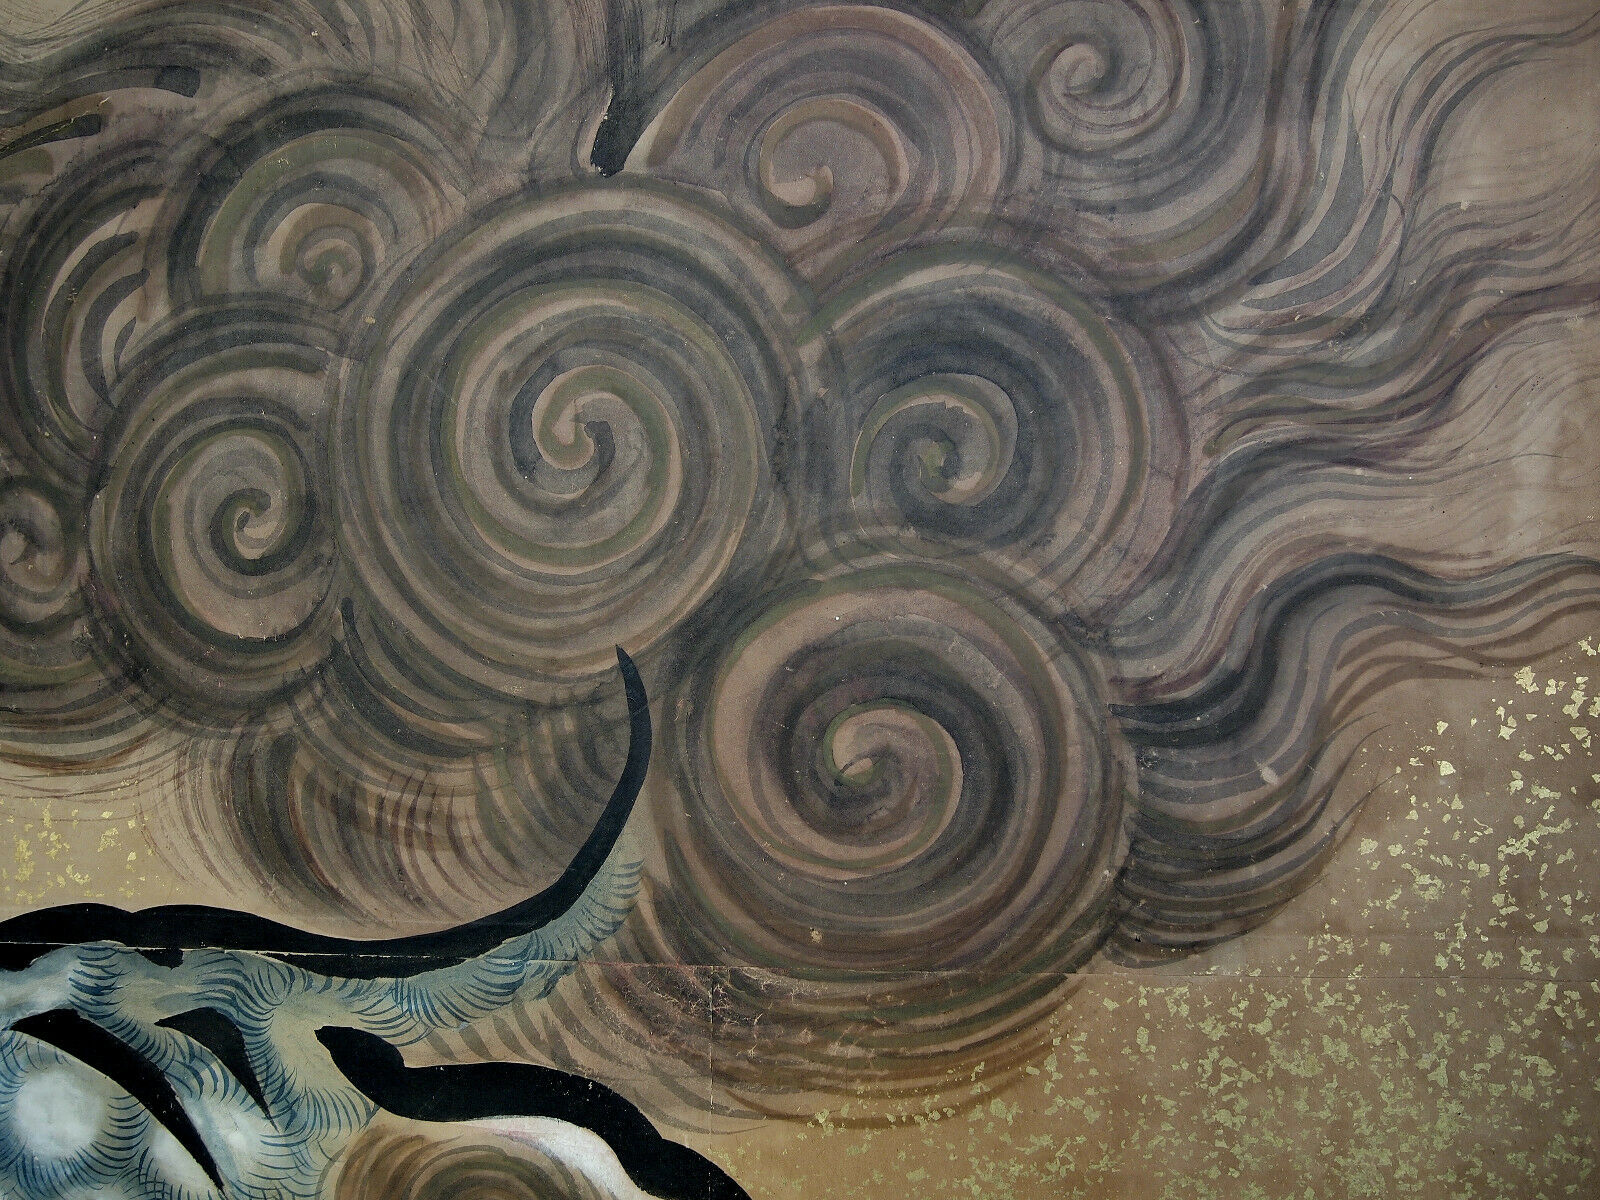 ANTIQUE KANO FOLDING SCREEN 1700 Chikanobu Edo Shishi Lion Byobu Japanese Tattoo - $25,000.00